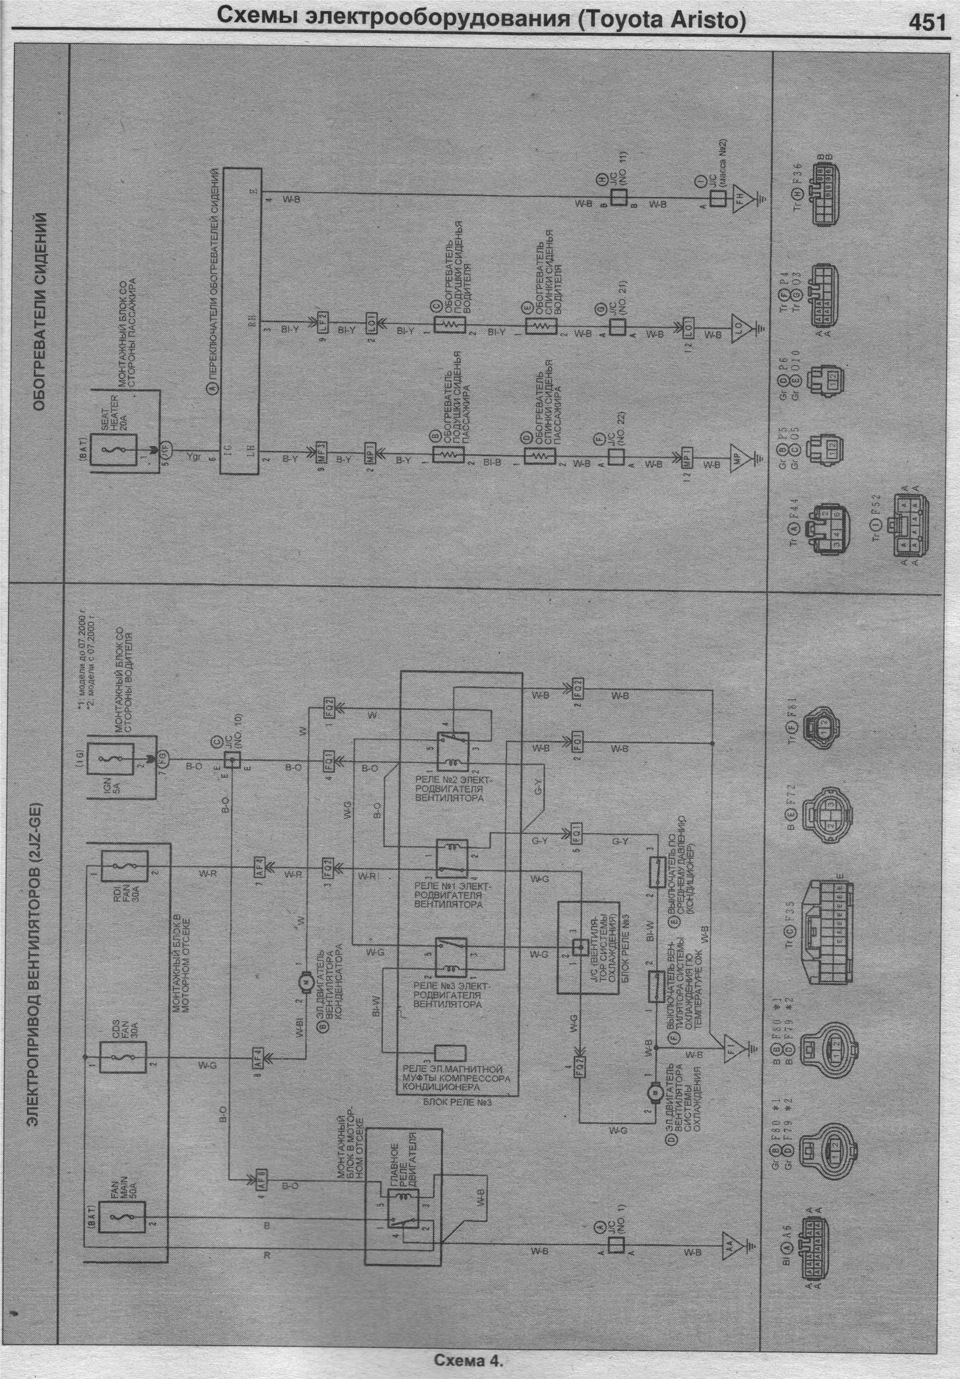 electrical equipment diagram Toyota aristo 97-05 — logbook